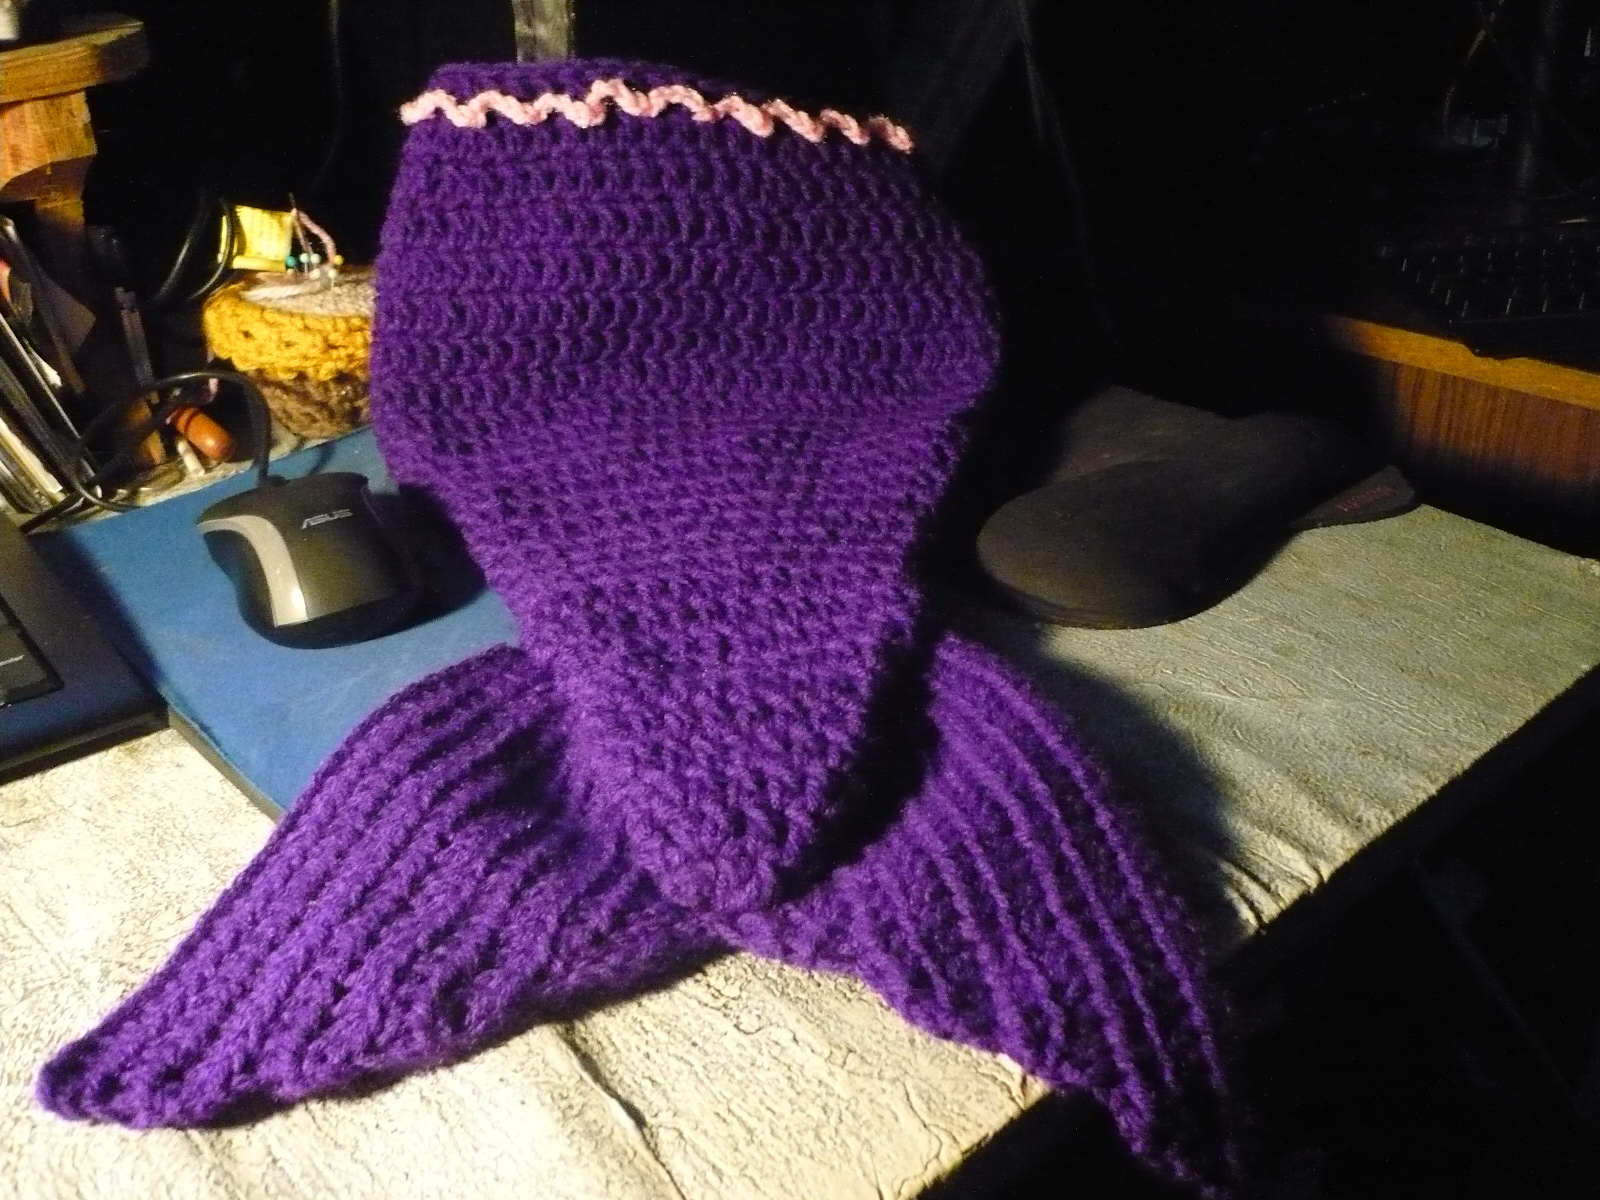 Amazing Crochet Mermaid Pattern for Baby's Mermaid Tail Stitches Crochet Mermaid Tail